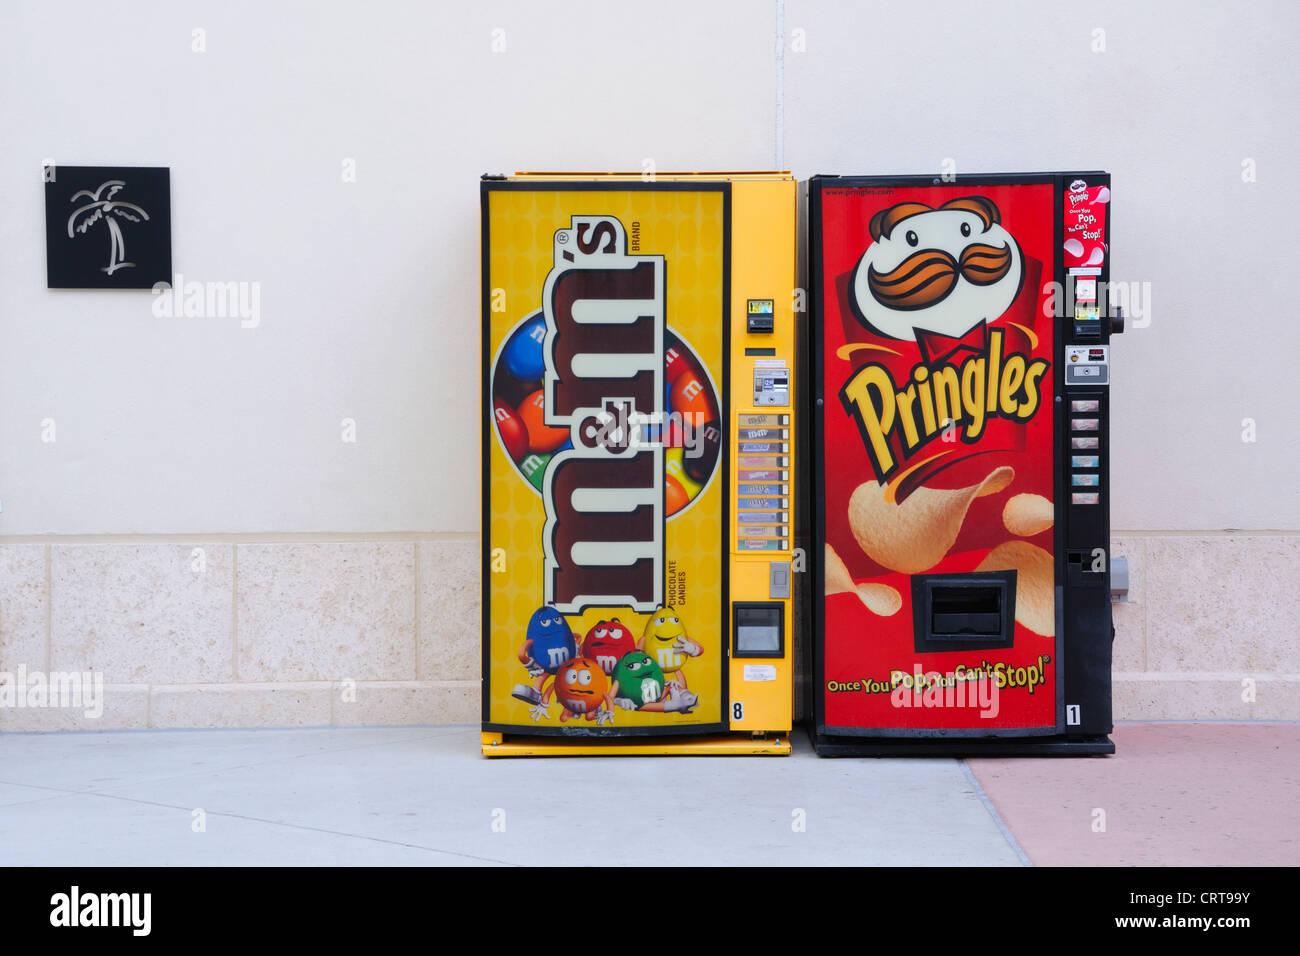 vending machine outlet